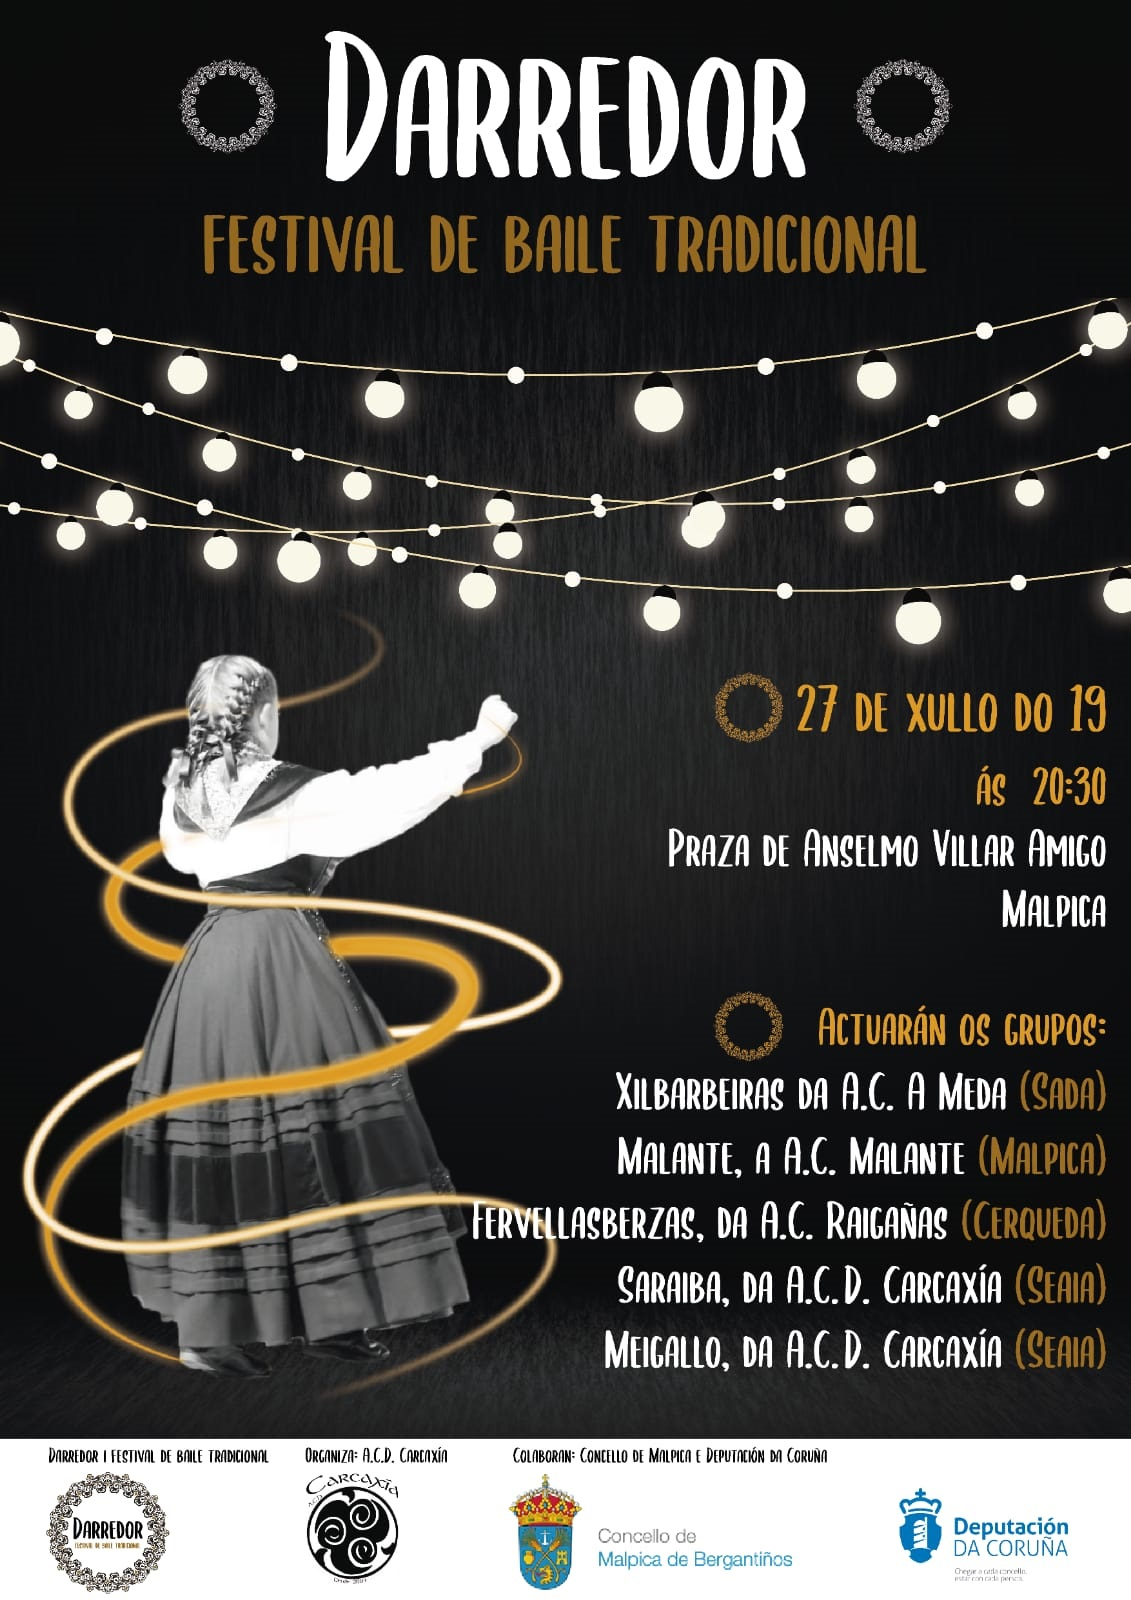 festival darredor